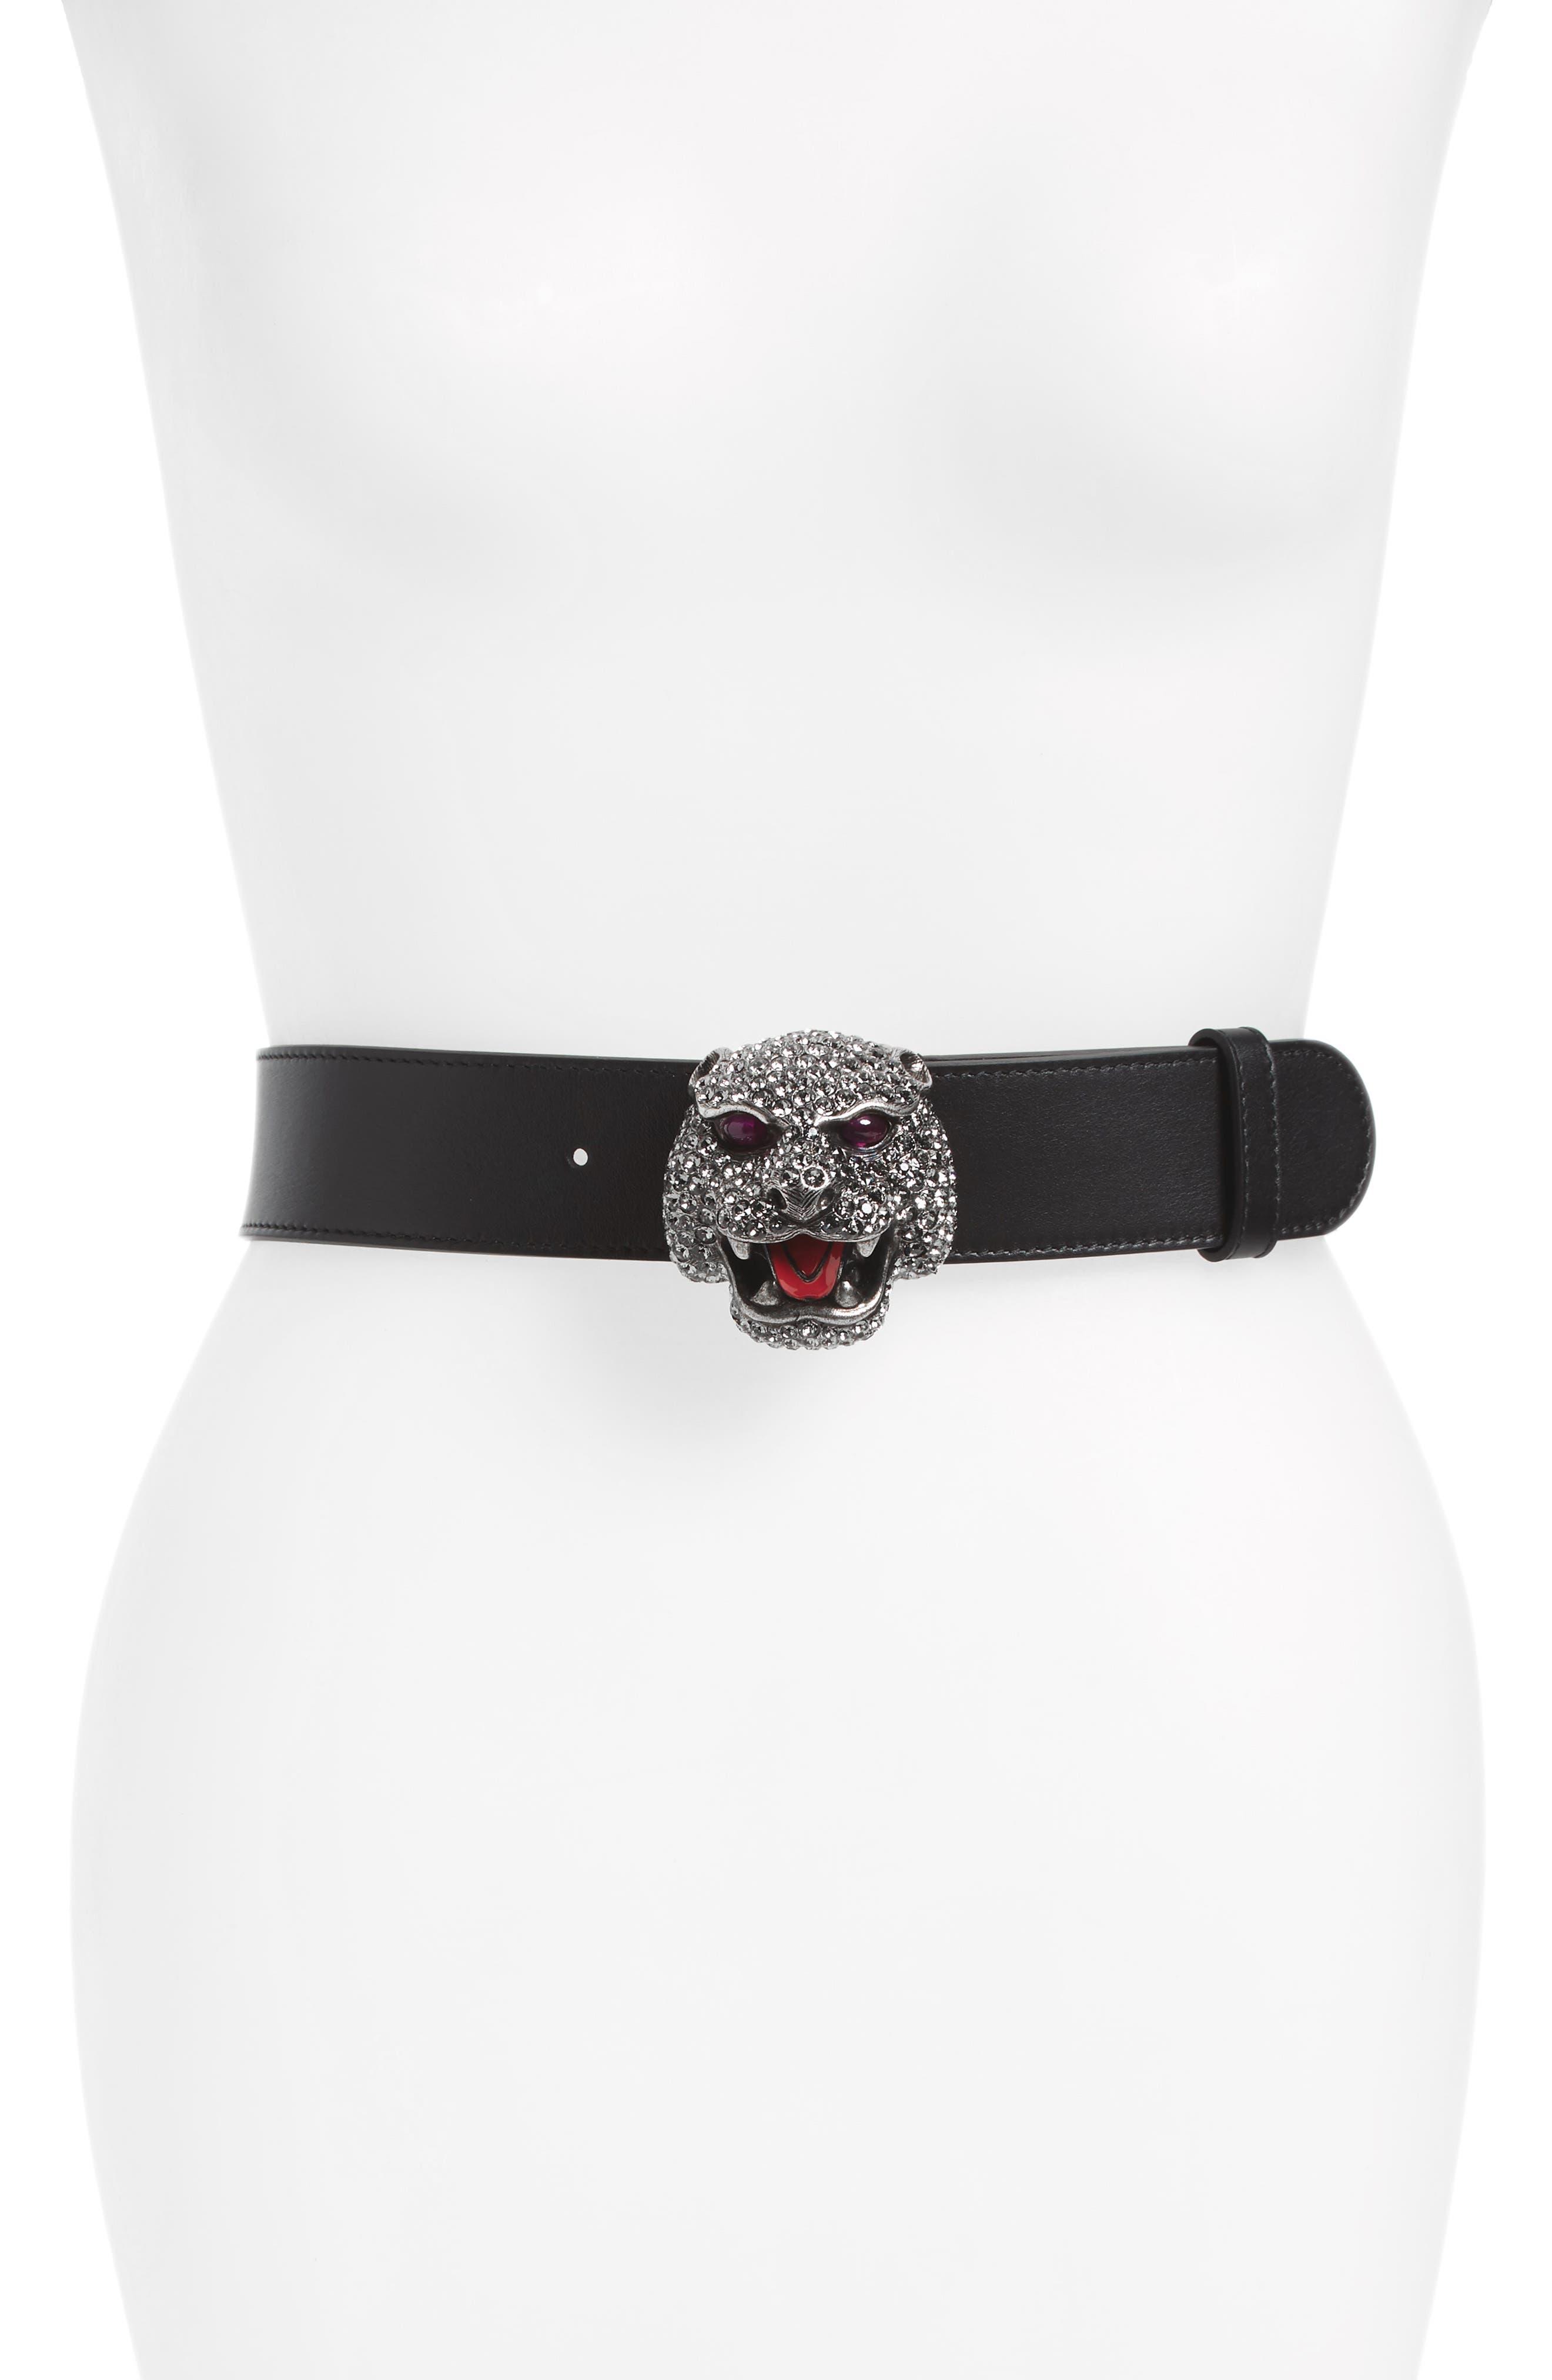 Tiger Buckle Calfskin Leather Belt,                             Main thumbnail 1, color,